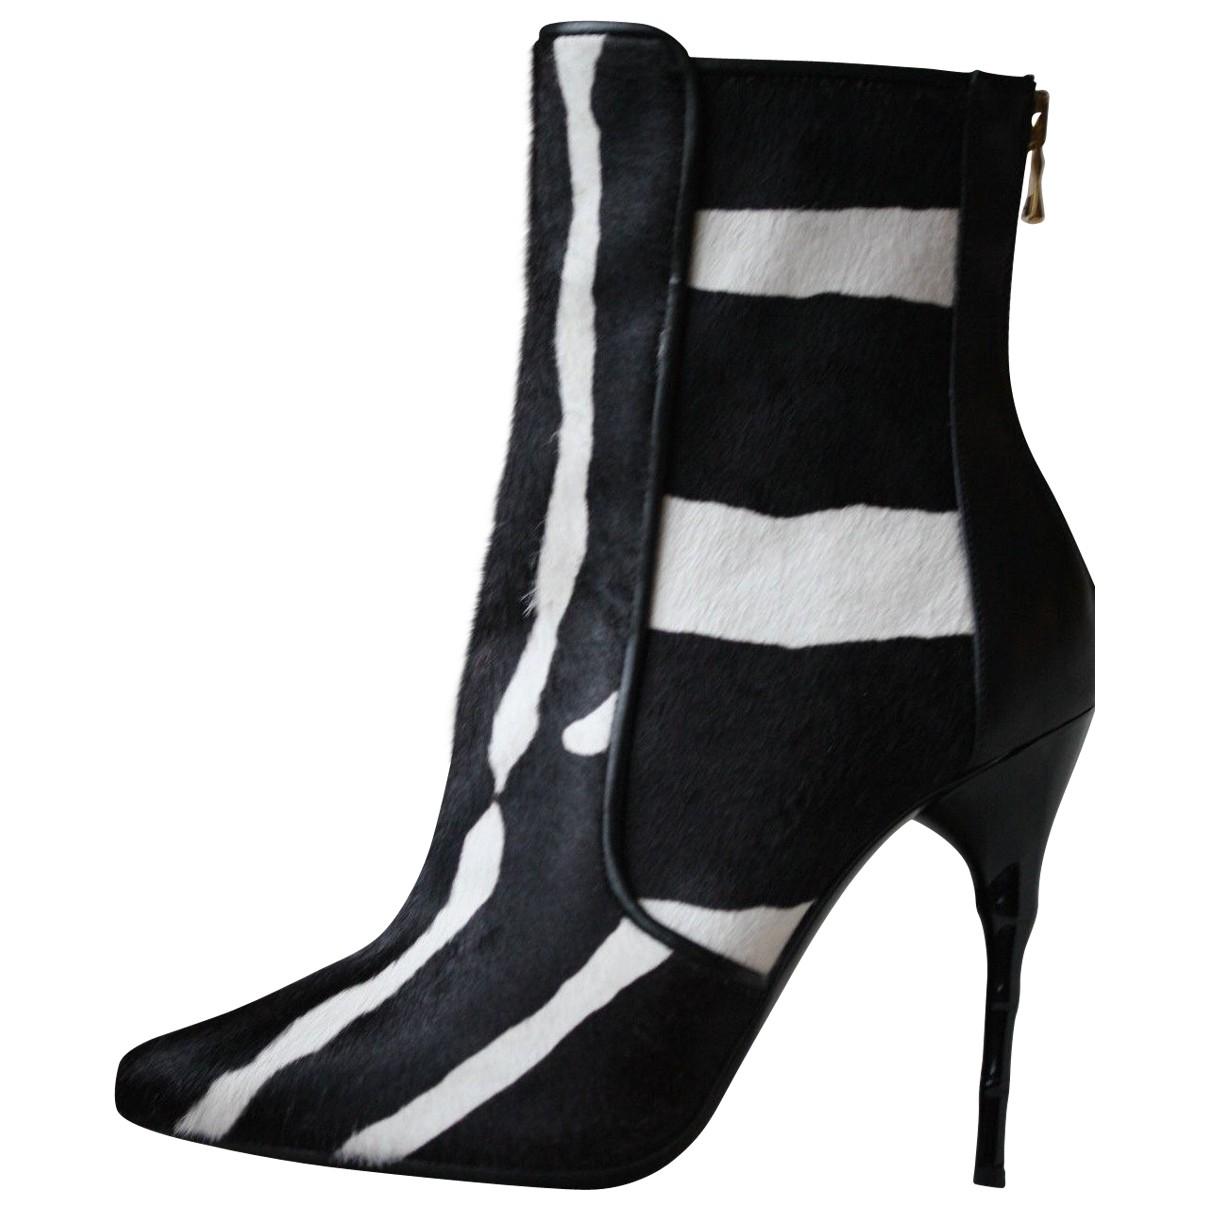 Balmain N Black Pony-style calfskin Ankle boots for Women 37.5 EU